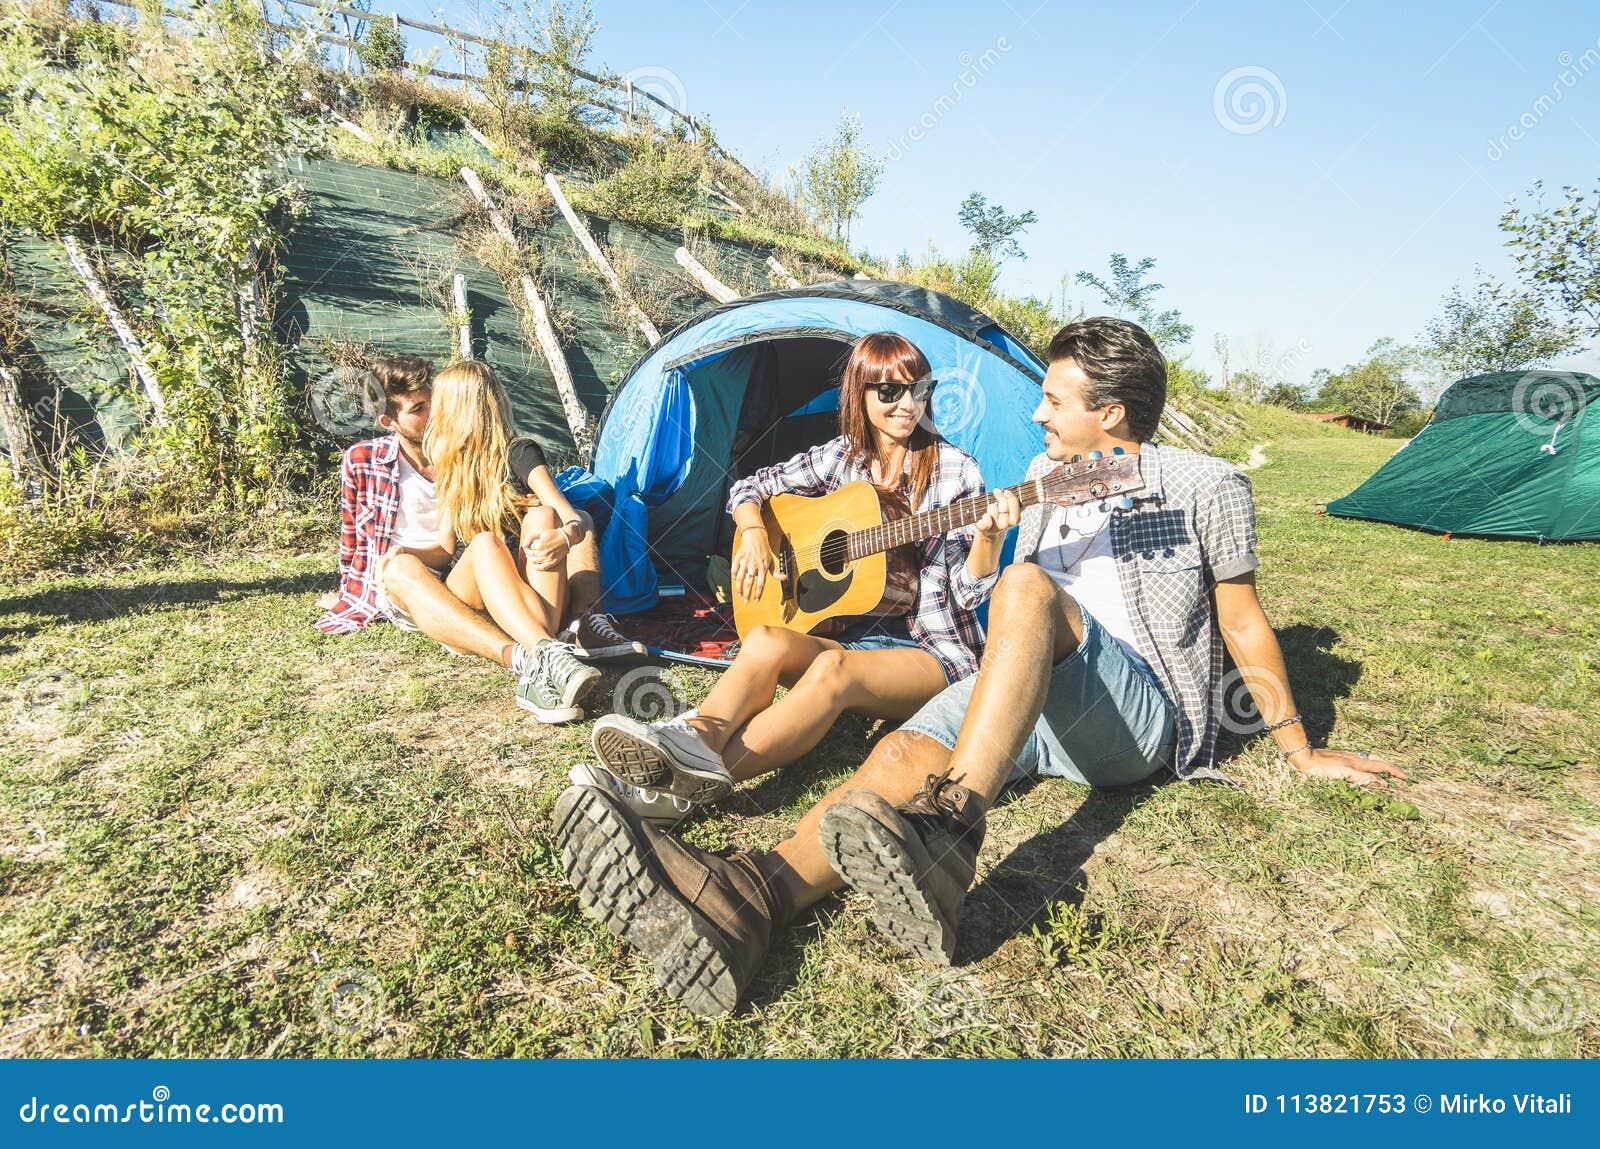 Friends group having fun outdoor cheering at picnic camp